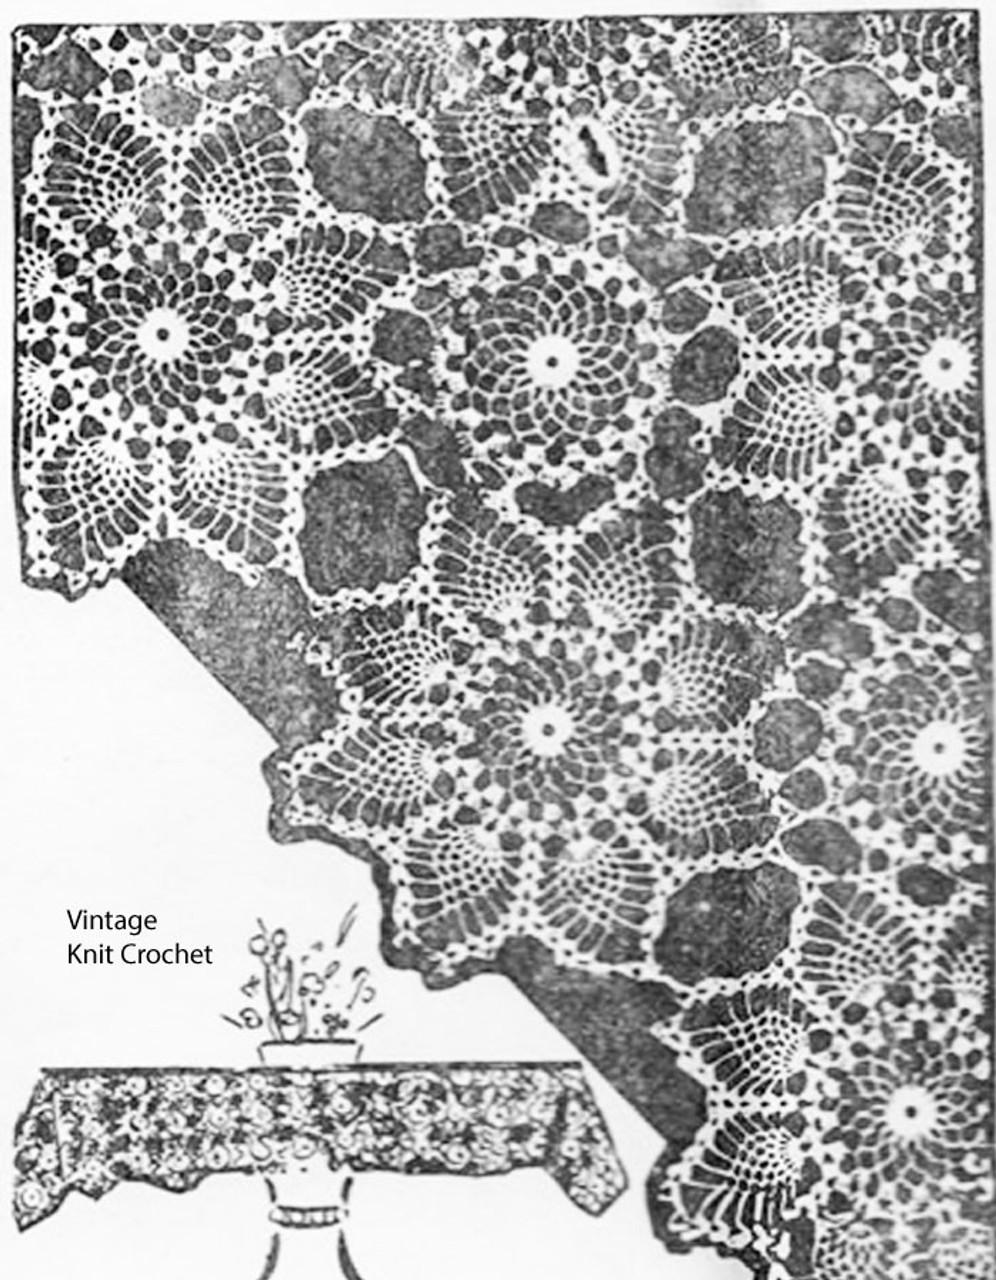 Vintage pineapple crochet medallion pattern, tablecloth, Design 1128